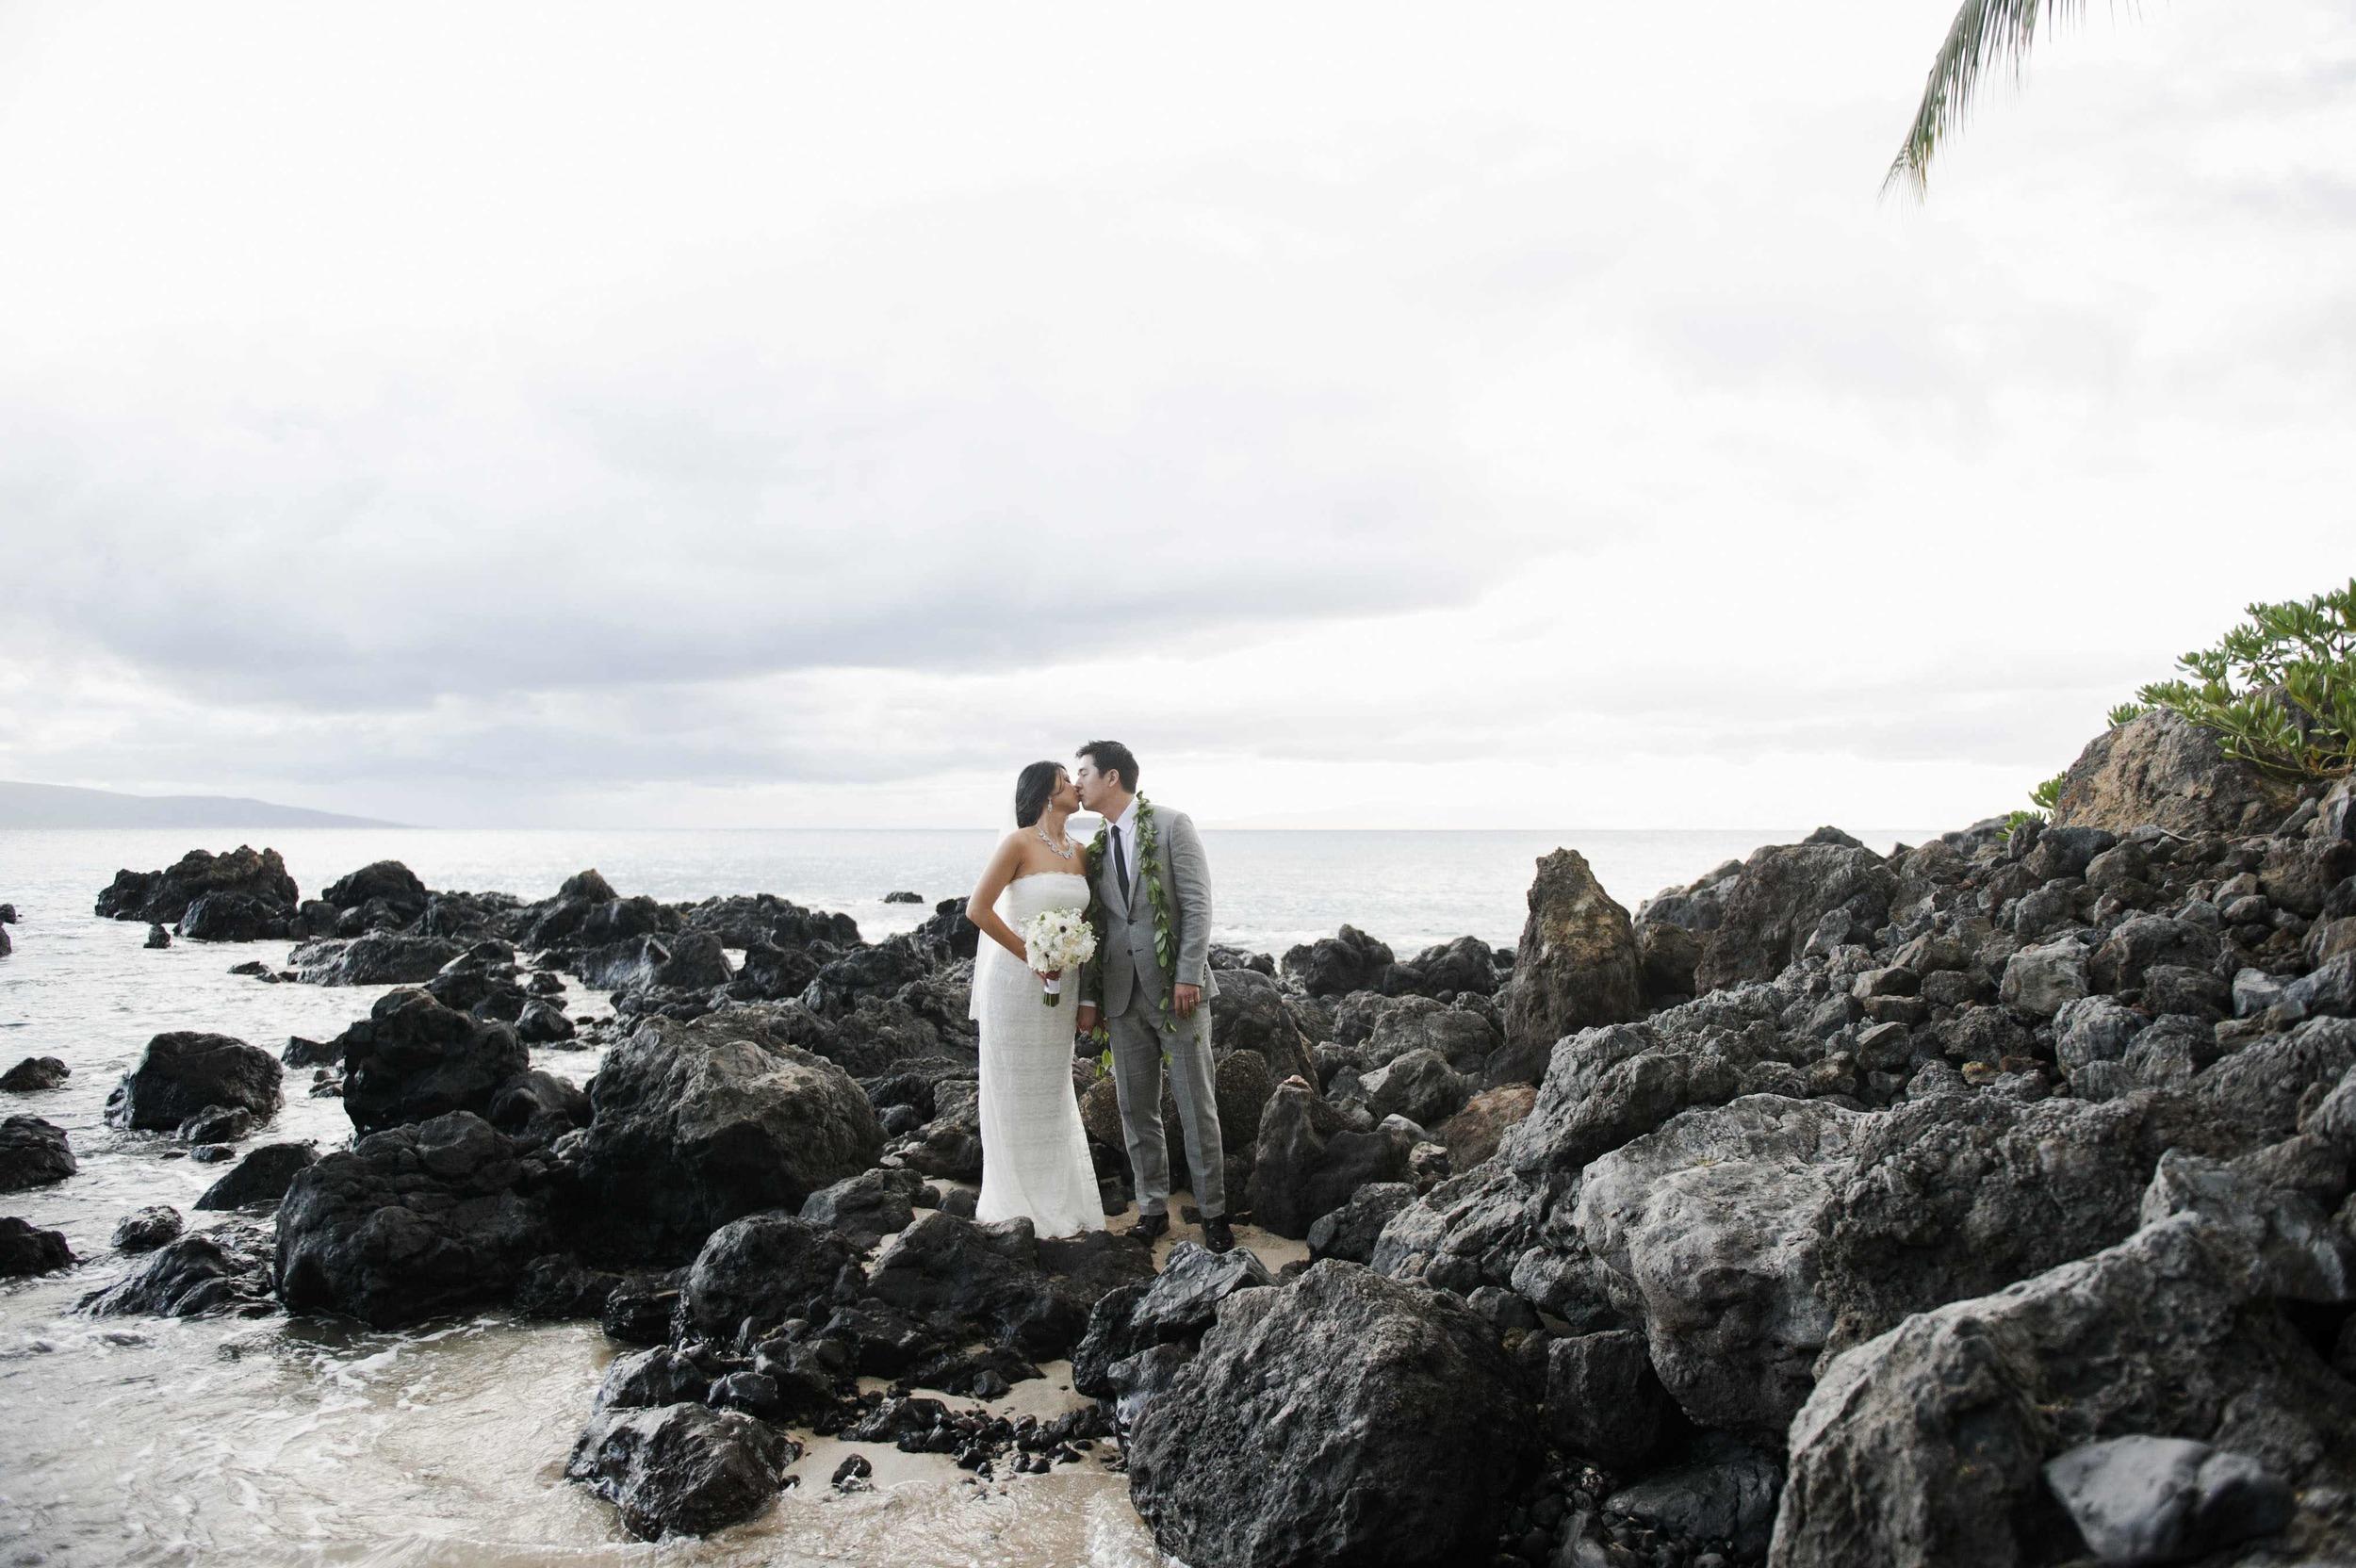 Destination Wedding - Bliss Wedding Design